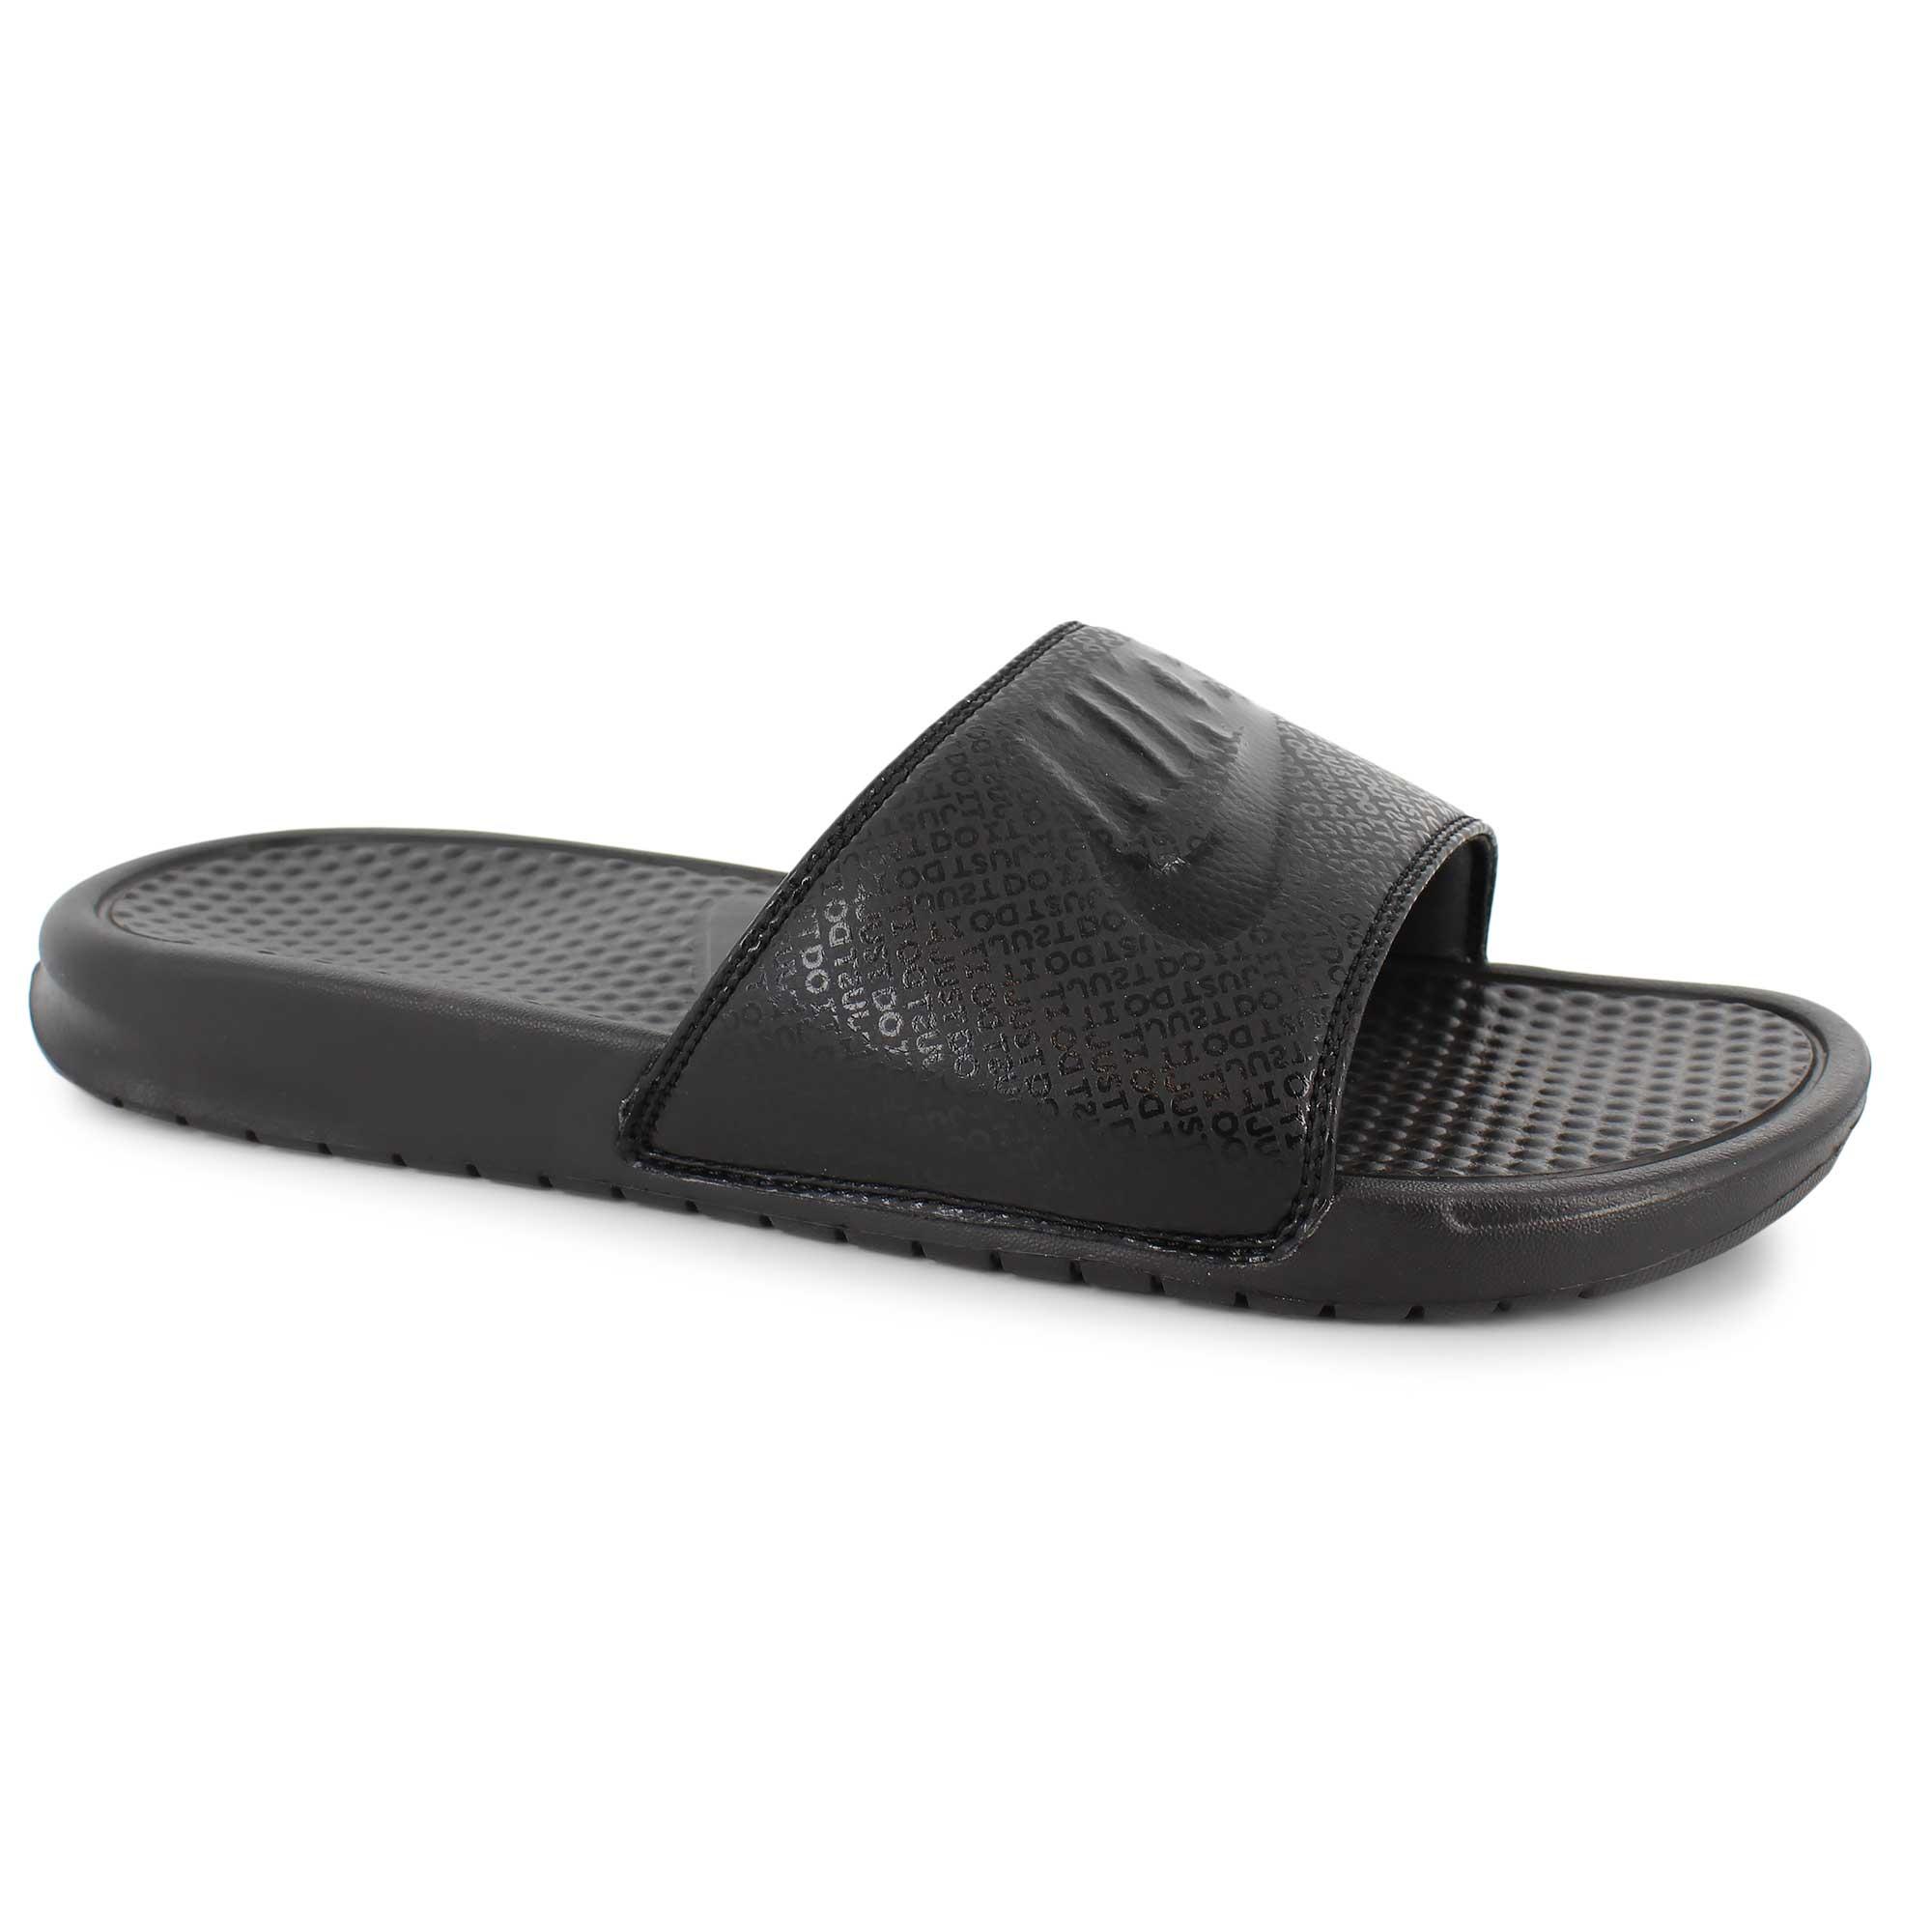 Nike Benassi Just Do It | SHOE DEPT ENCORE